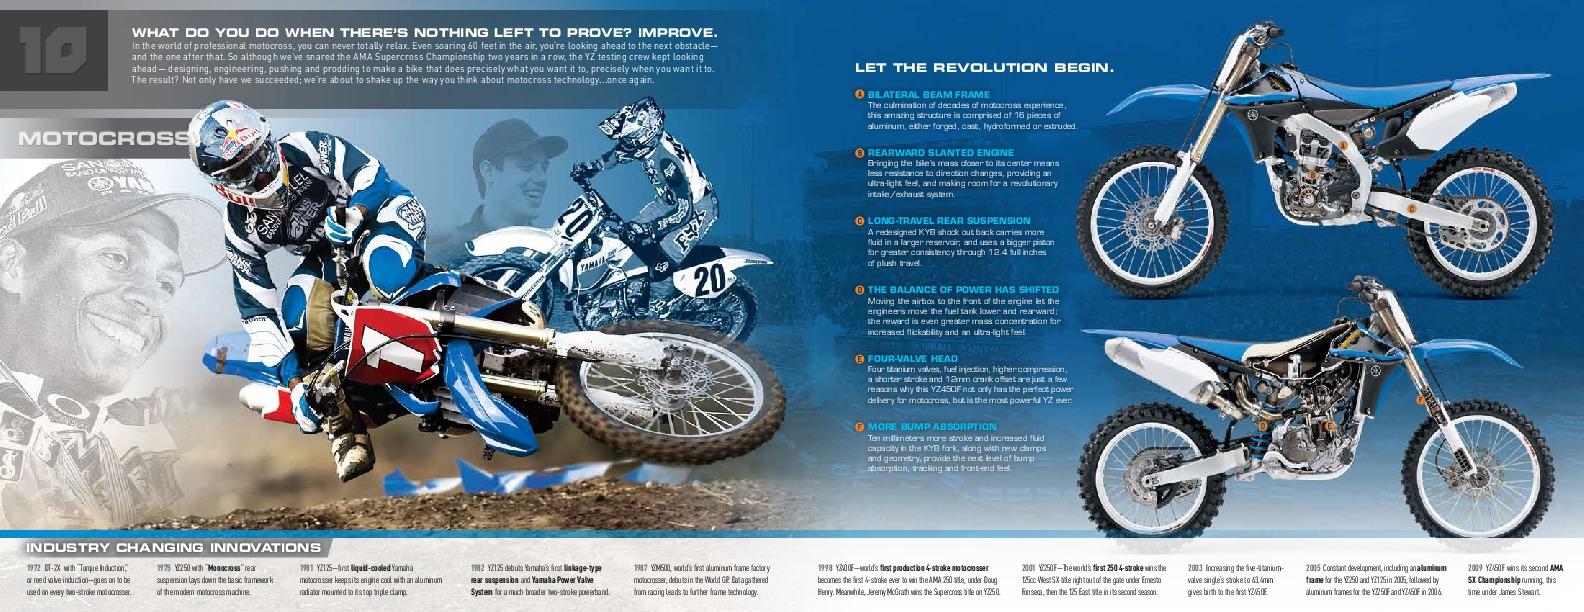 2010 yamaha motocross off road yz250 450 yx28 125 wr250